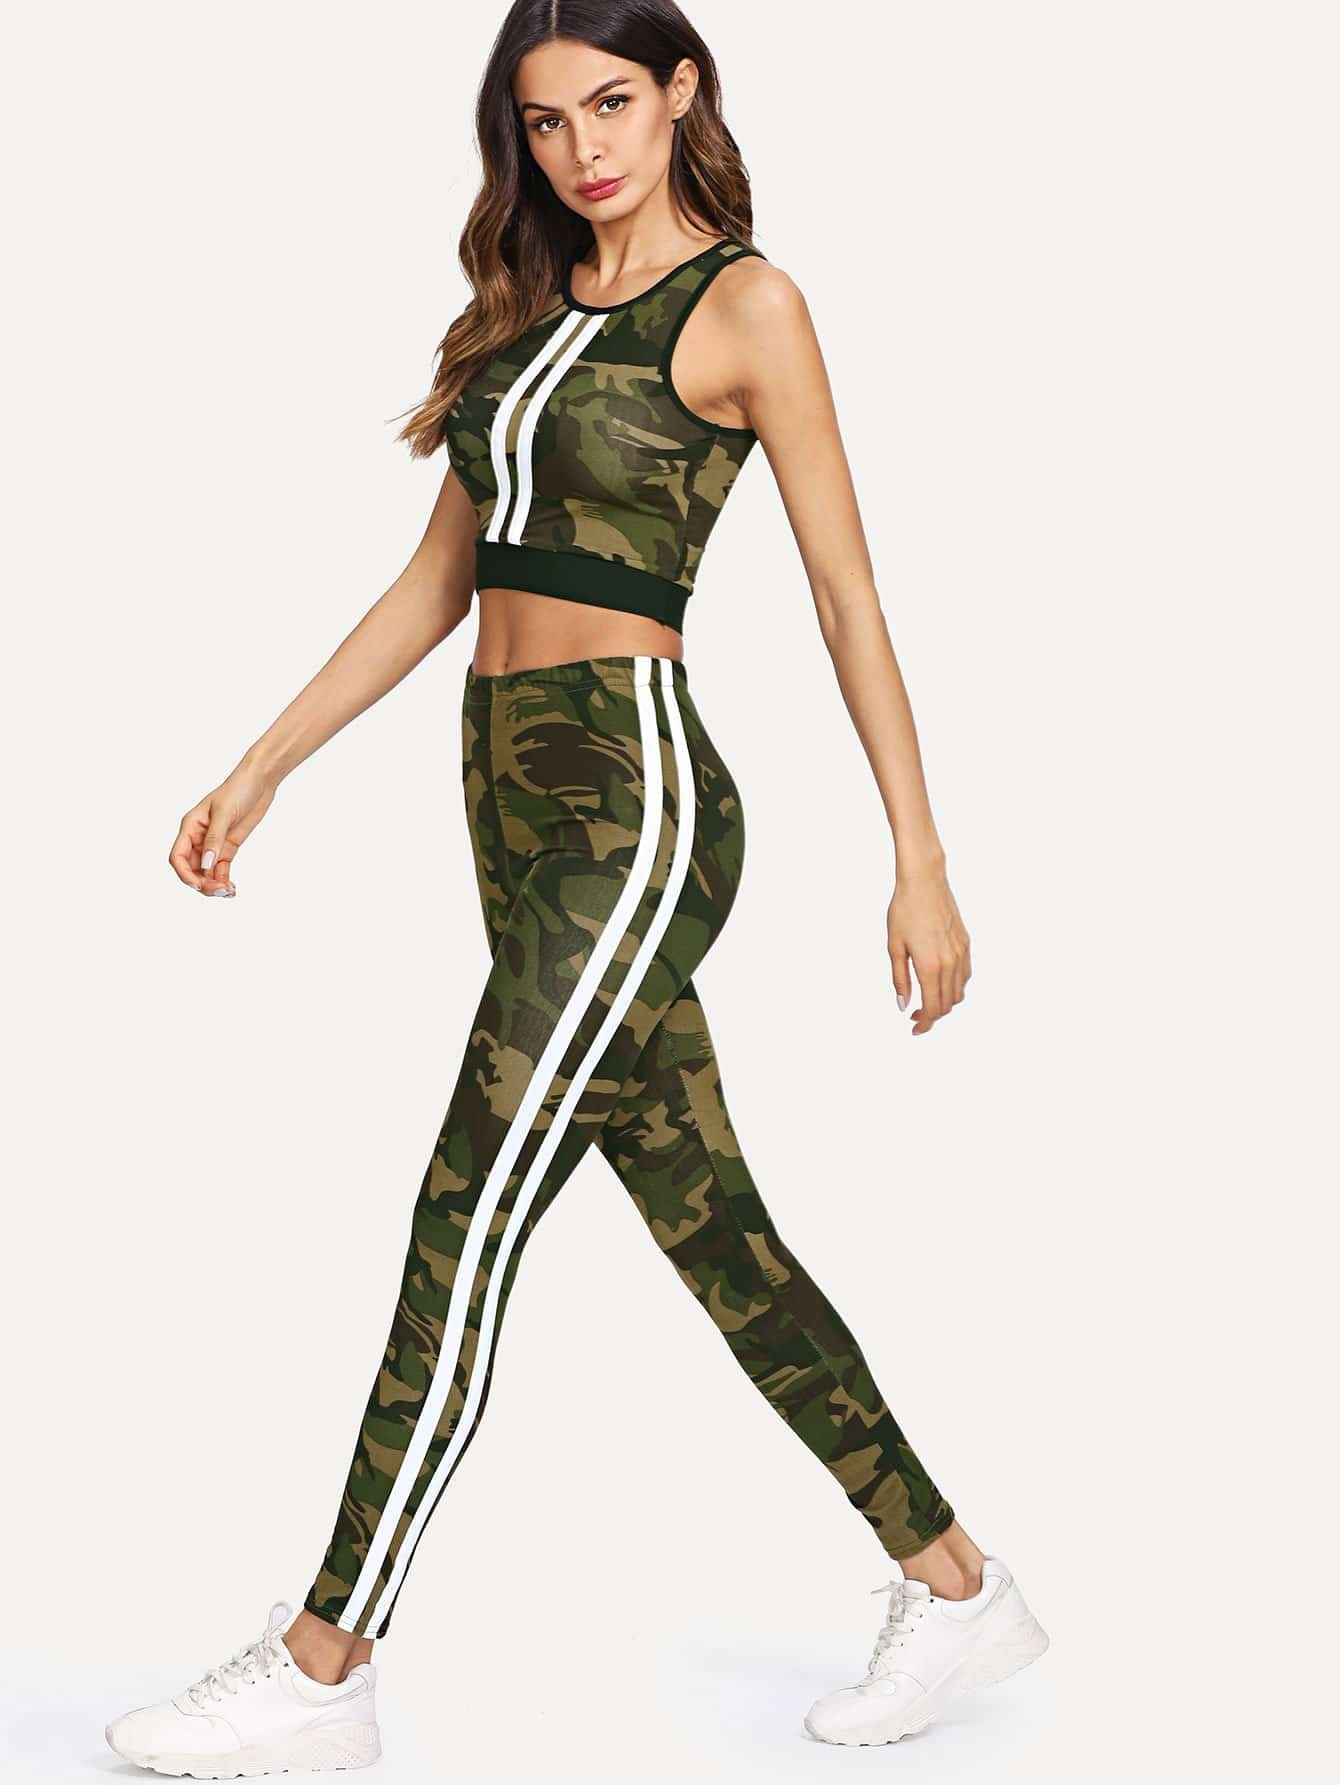 Camo Print Crop Tank Top With Tape Side Leggings camouflage print crop leggings